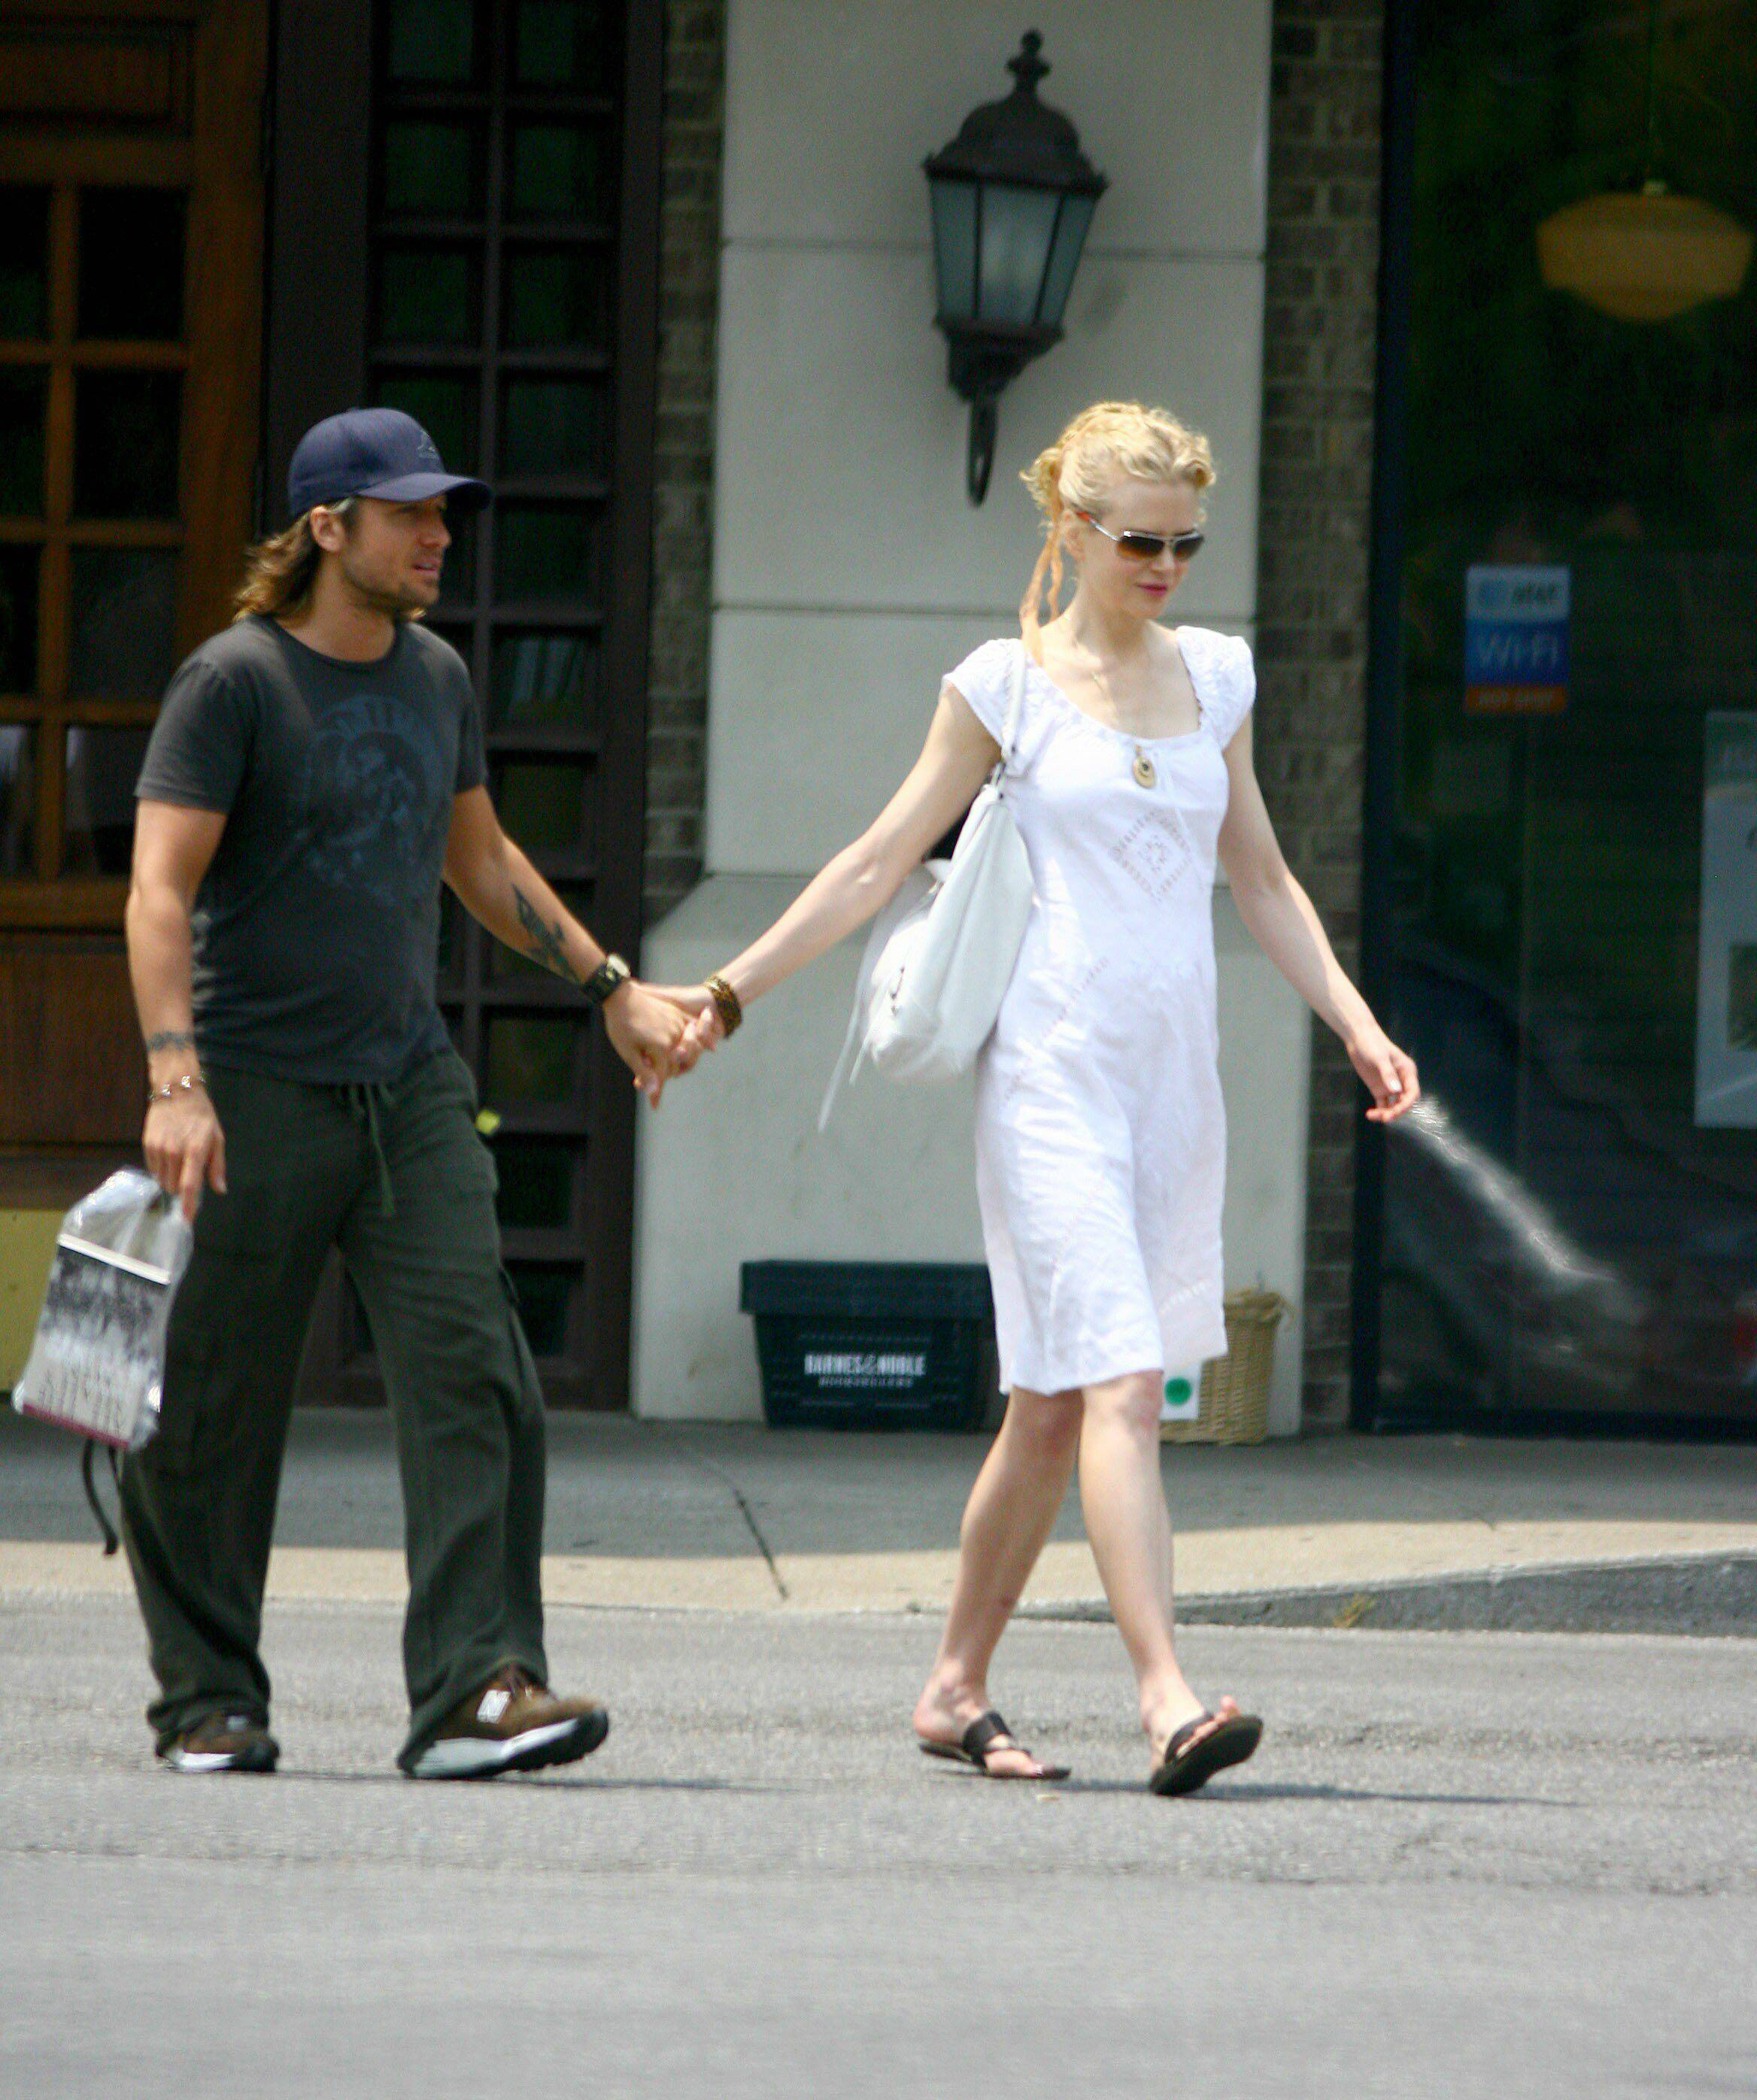 25985_Nicole_Kidman_and_Keith_Urban_buy_a_book_in_Nashville_09_558lo.jpg